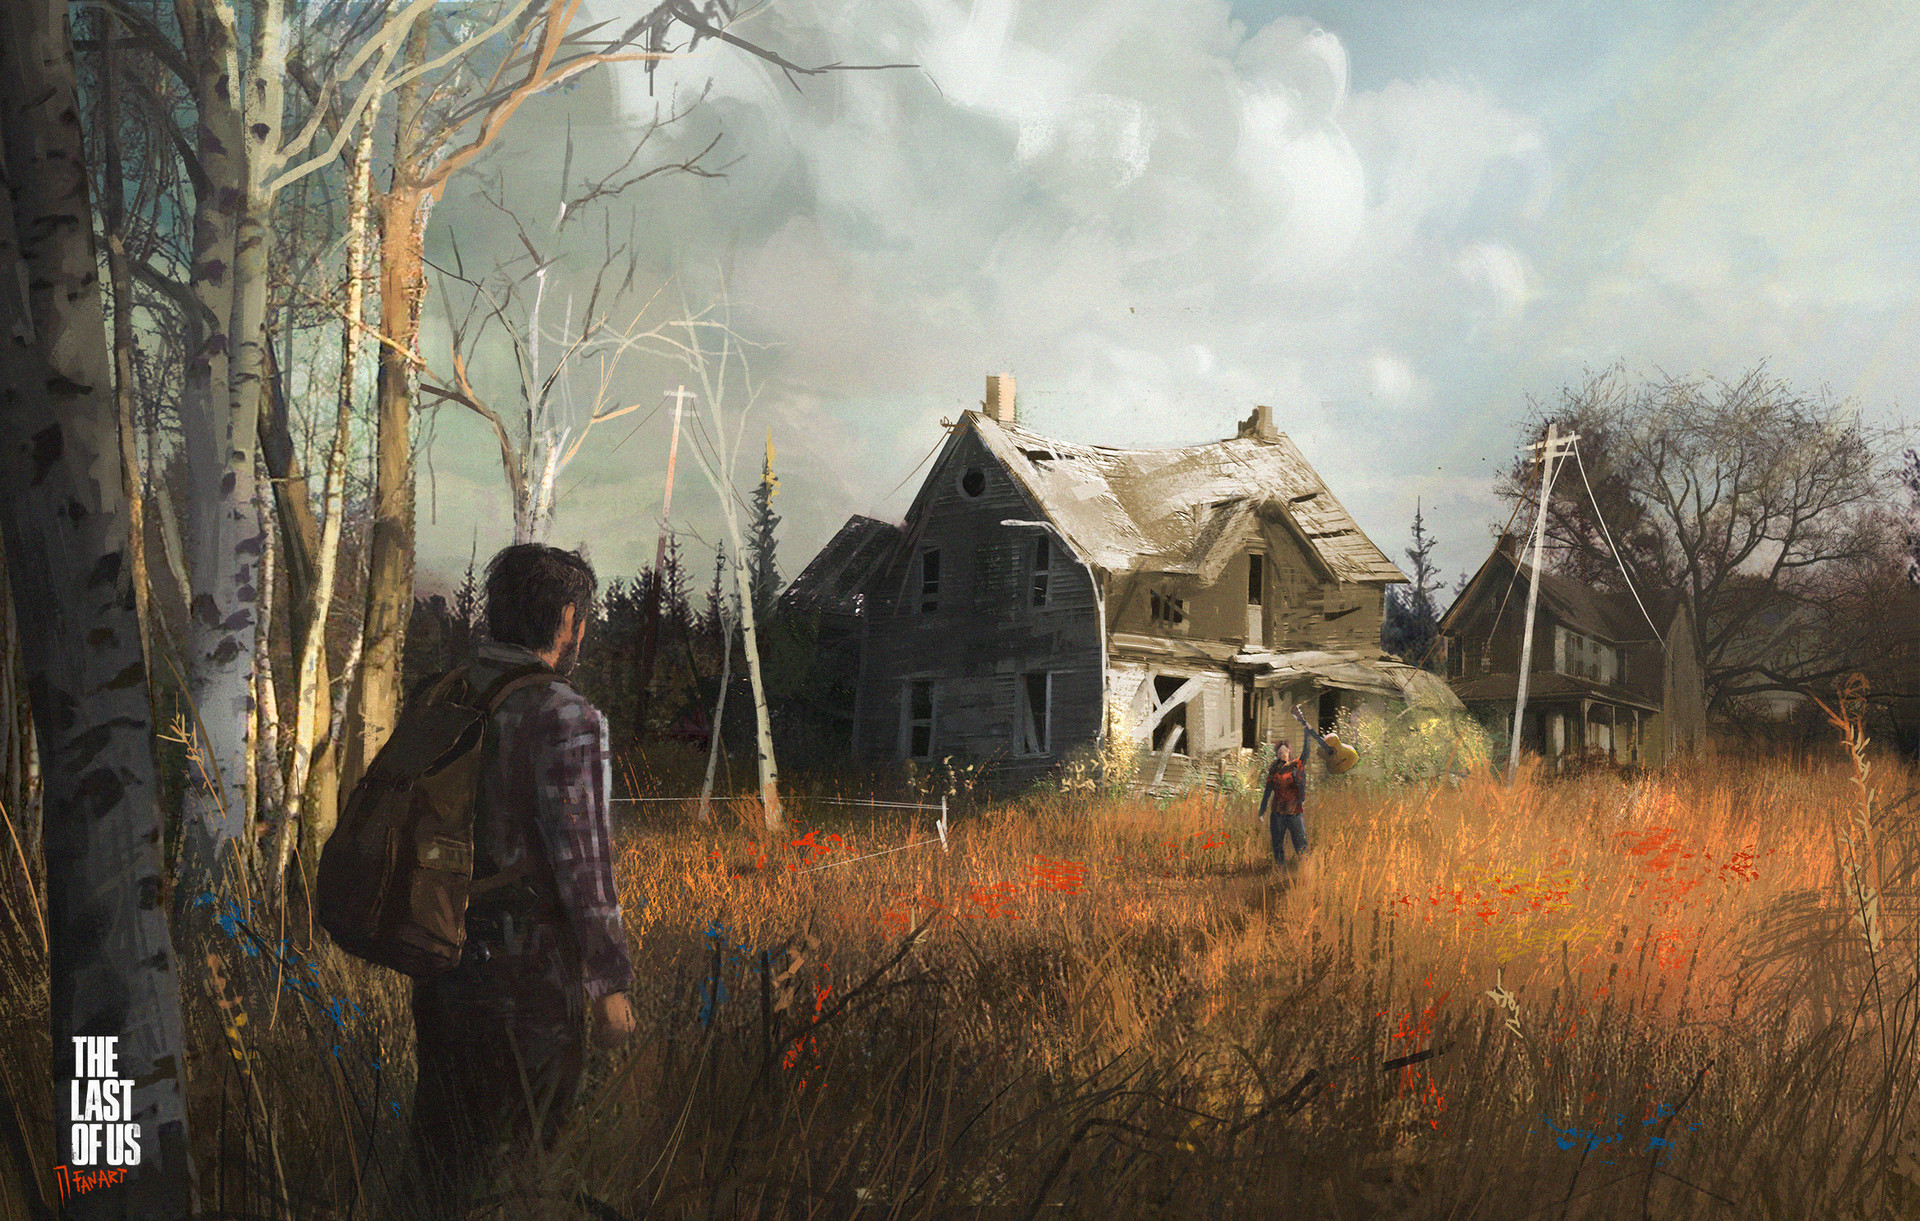 The Last of Us - Music Lounge